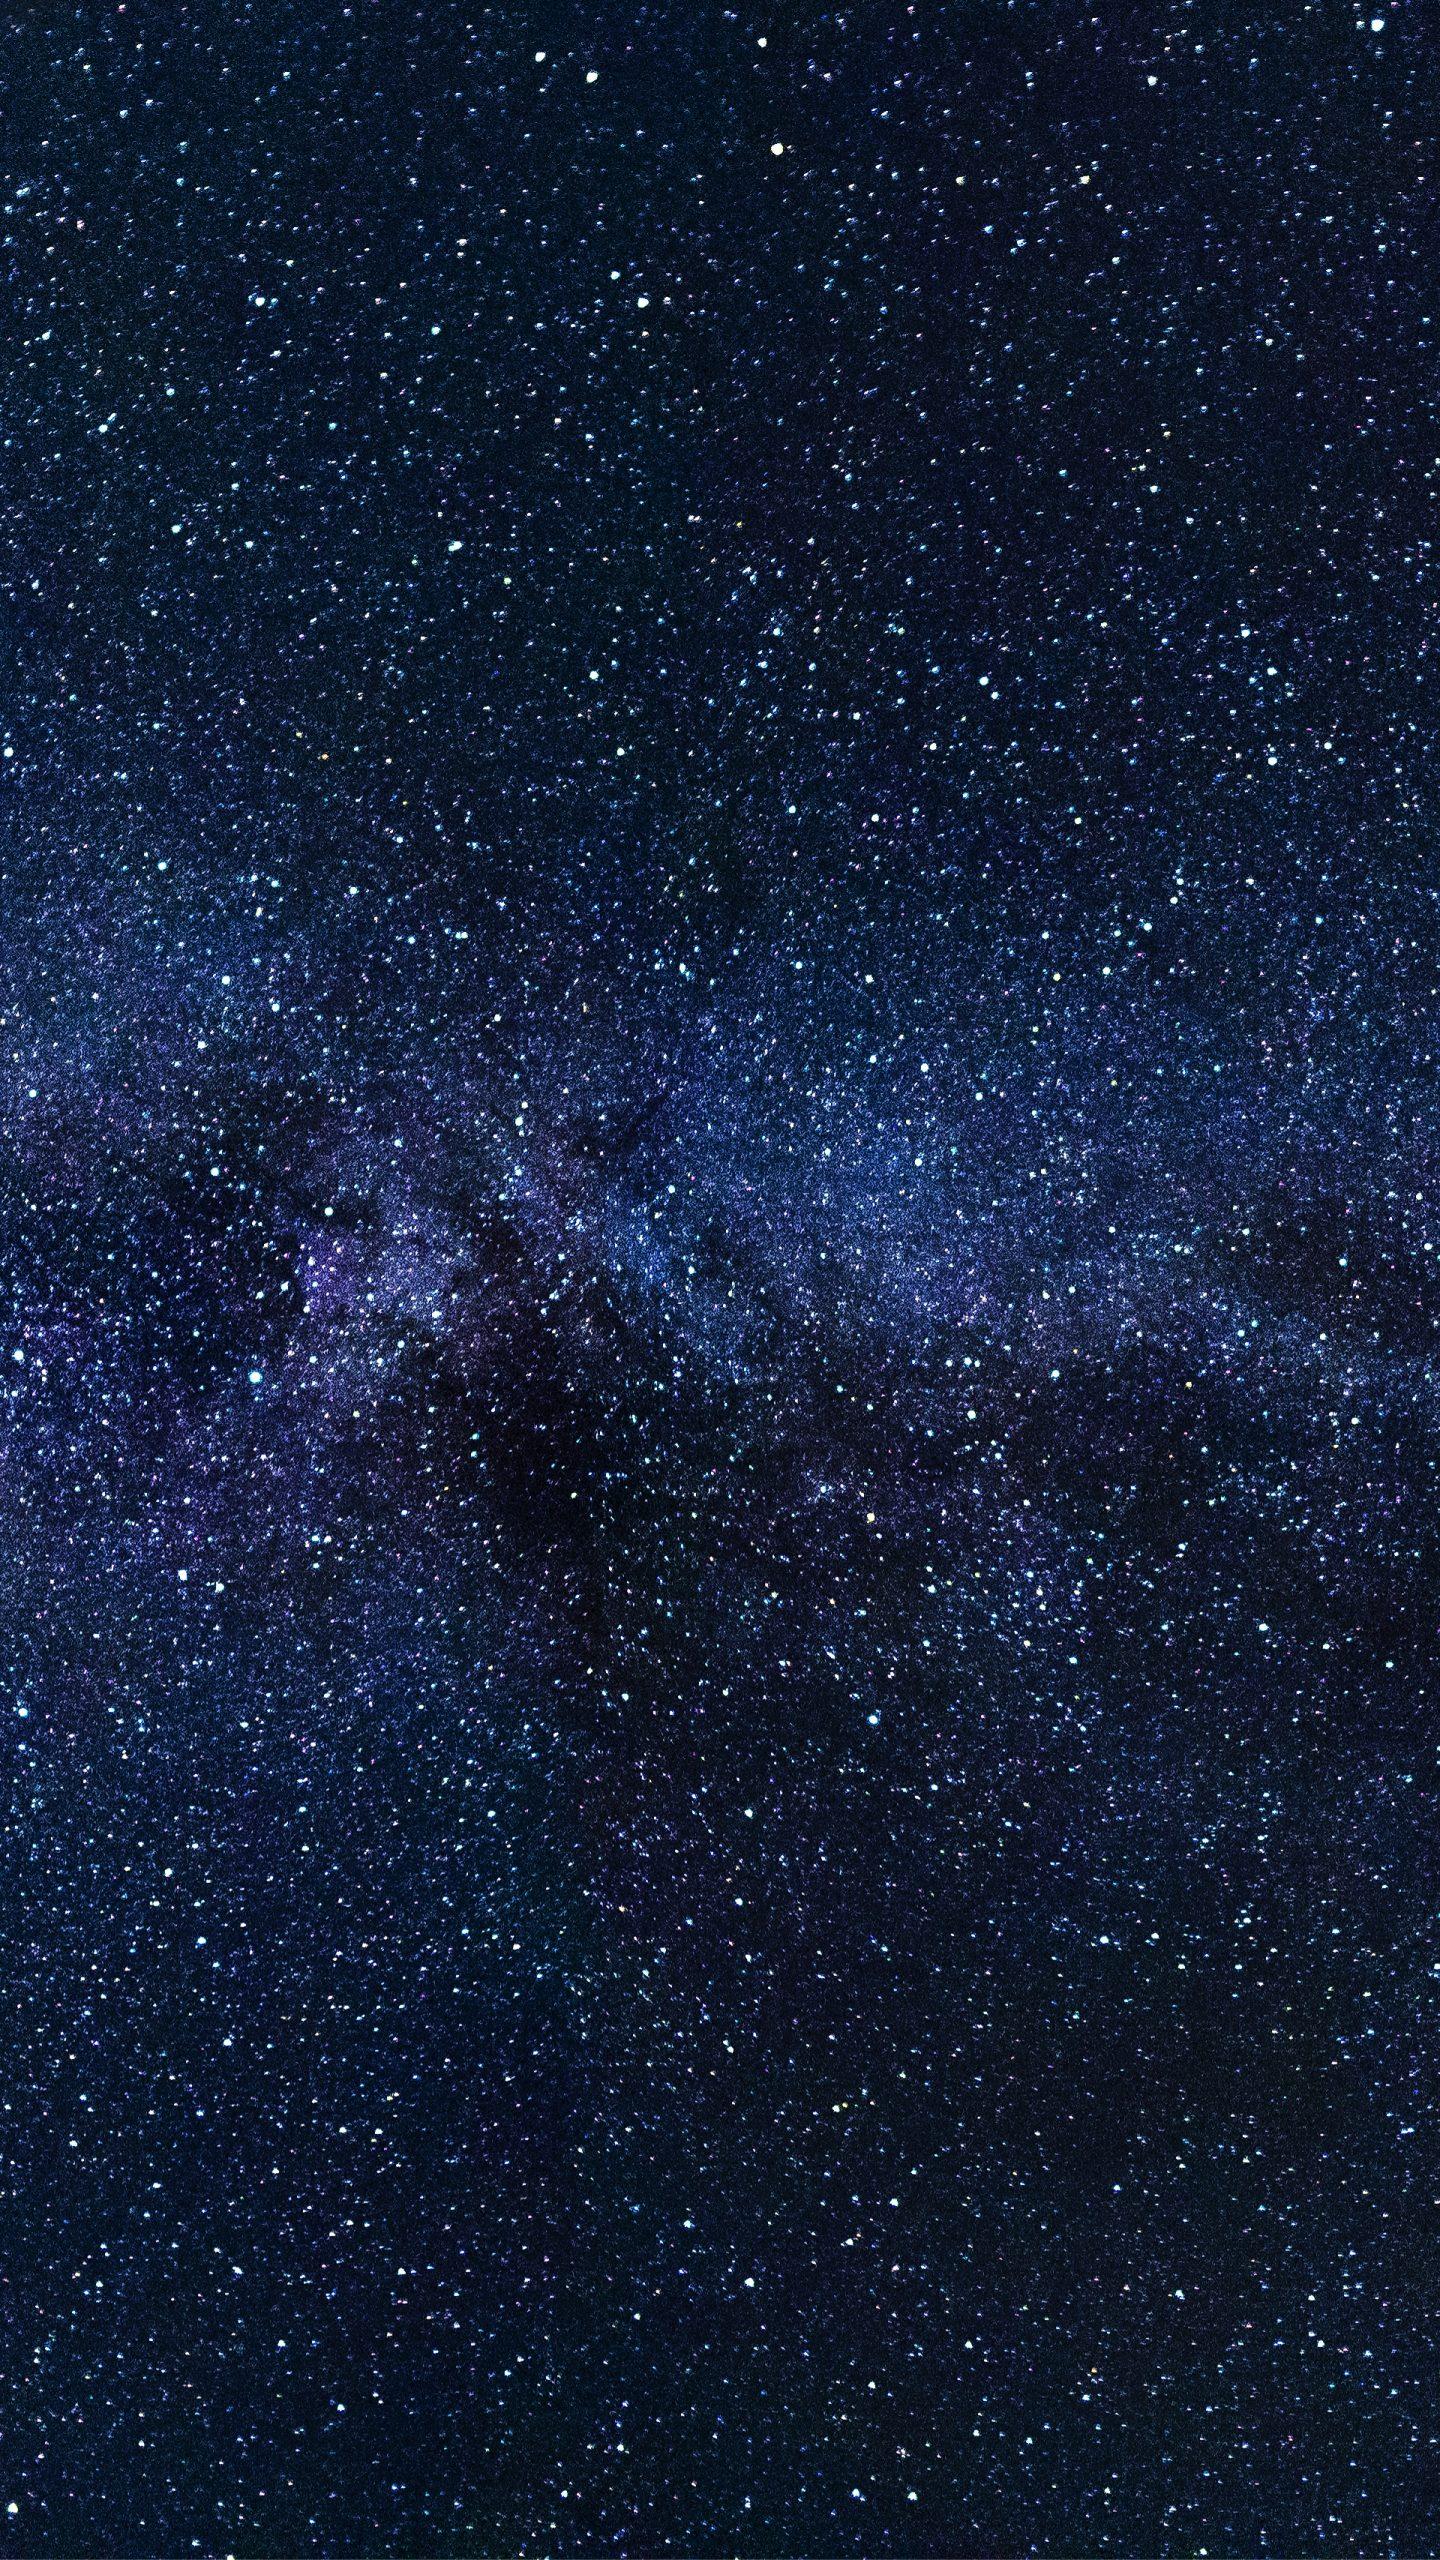 Starry Sky 5k Uhd Wallpaper